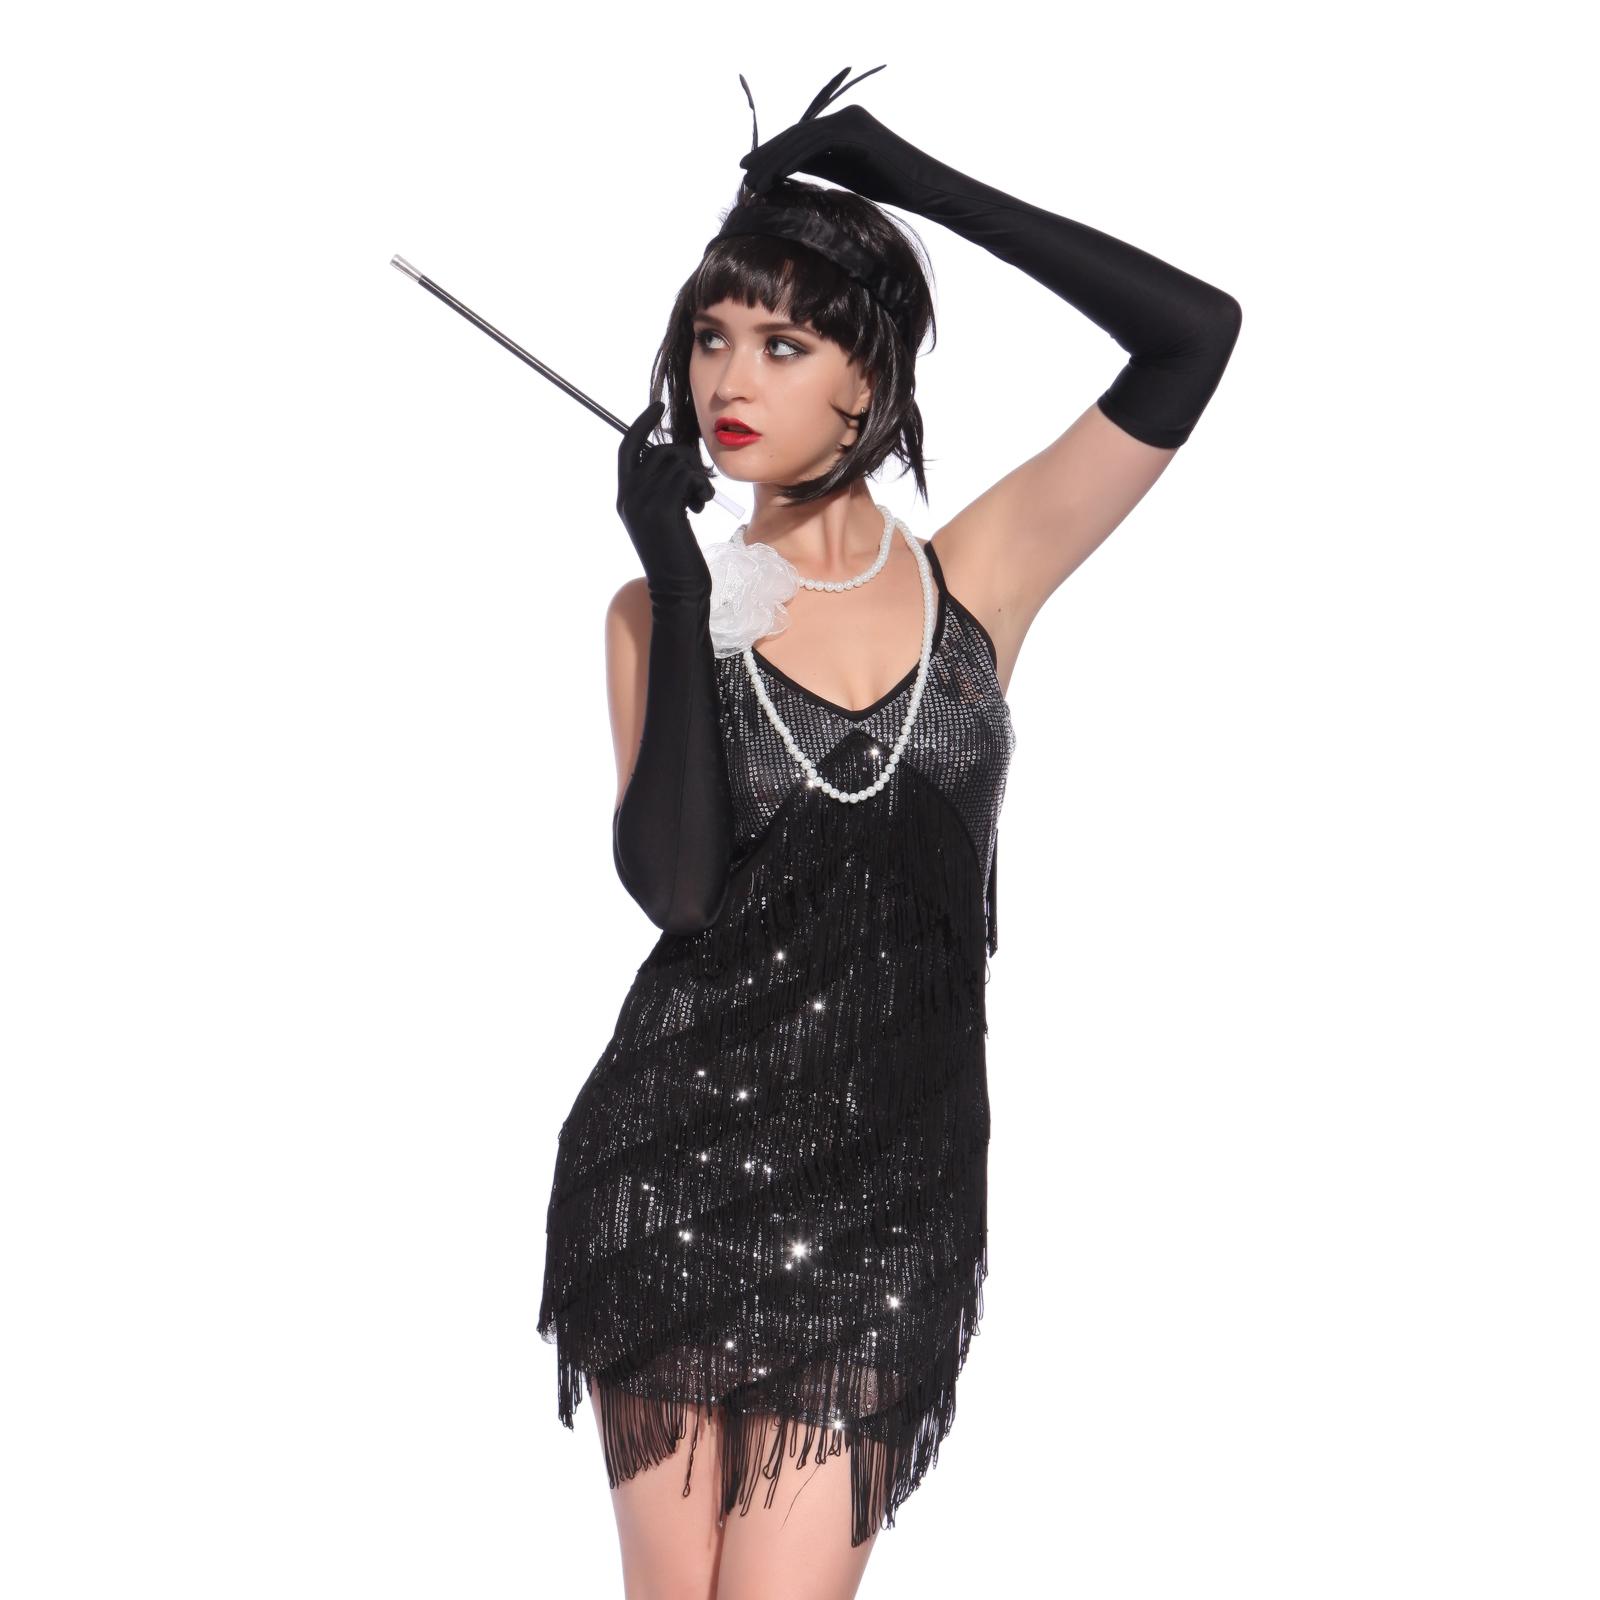 costume deguisement robe a frange sequin 20s charleston vintage carnaval soiree ebay. Black Bedroom Furniture Sets. Home Design Ideas